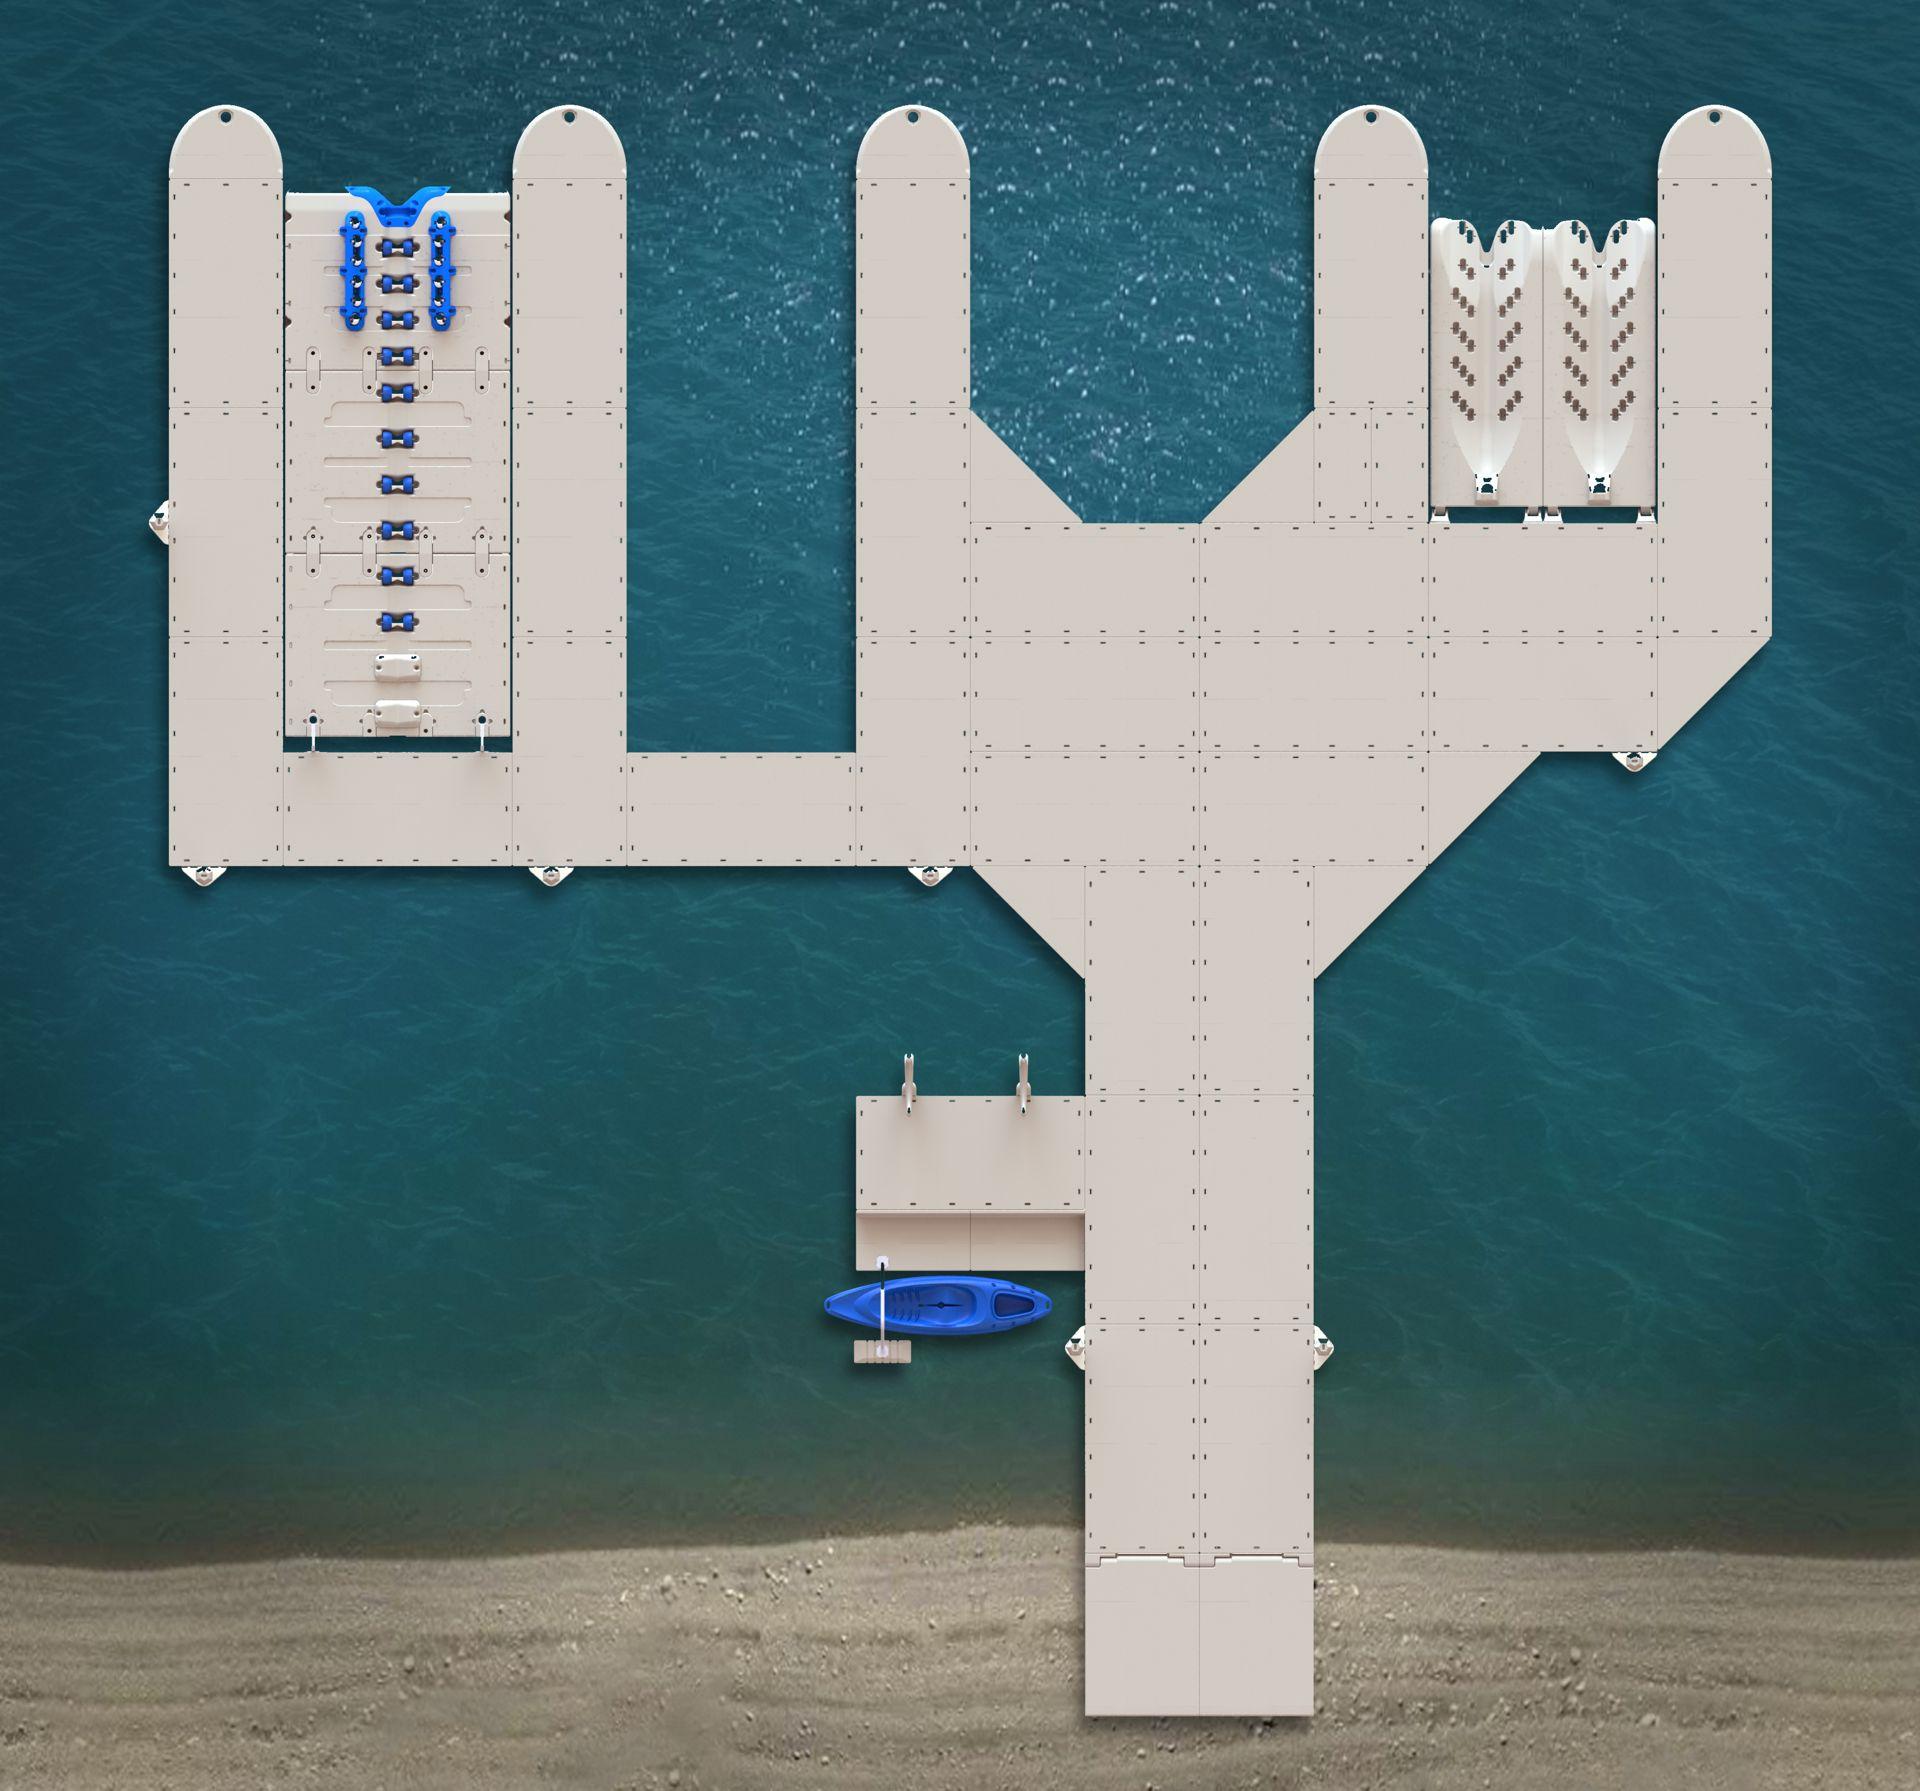 mobile shipyard, mobile hot tub, mobile swimming pool, mobile restrooms, mobile river, mobile bridge, mobile storage shed, mobile floating deck, mobile island, on floating dock on mobile home